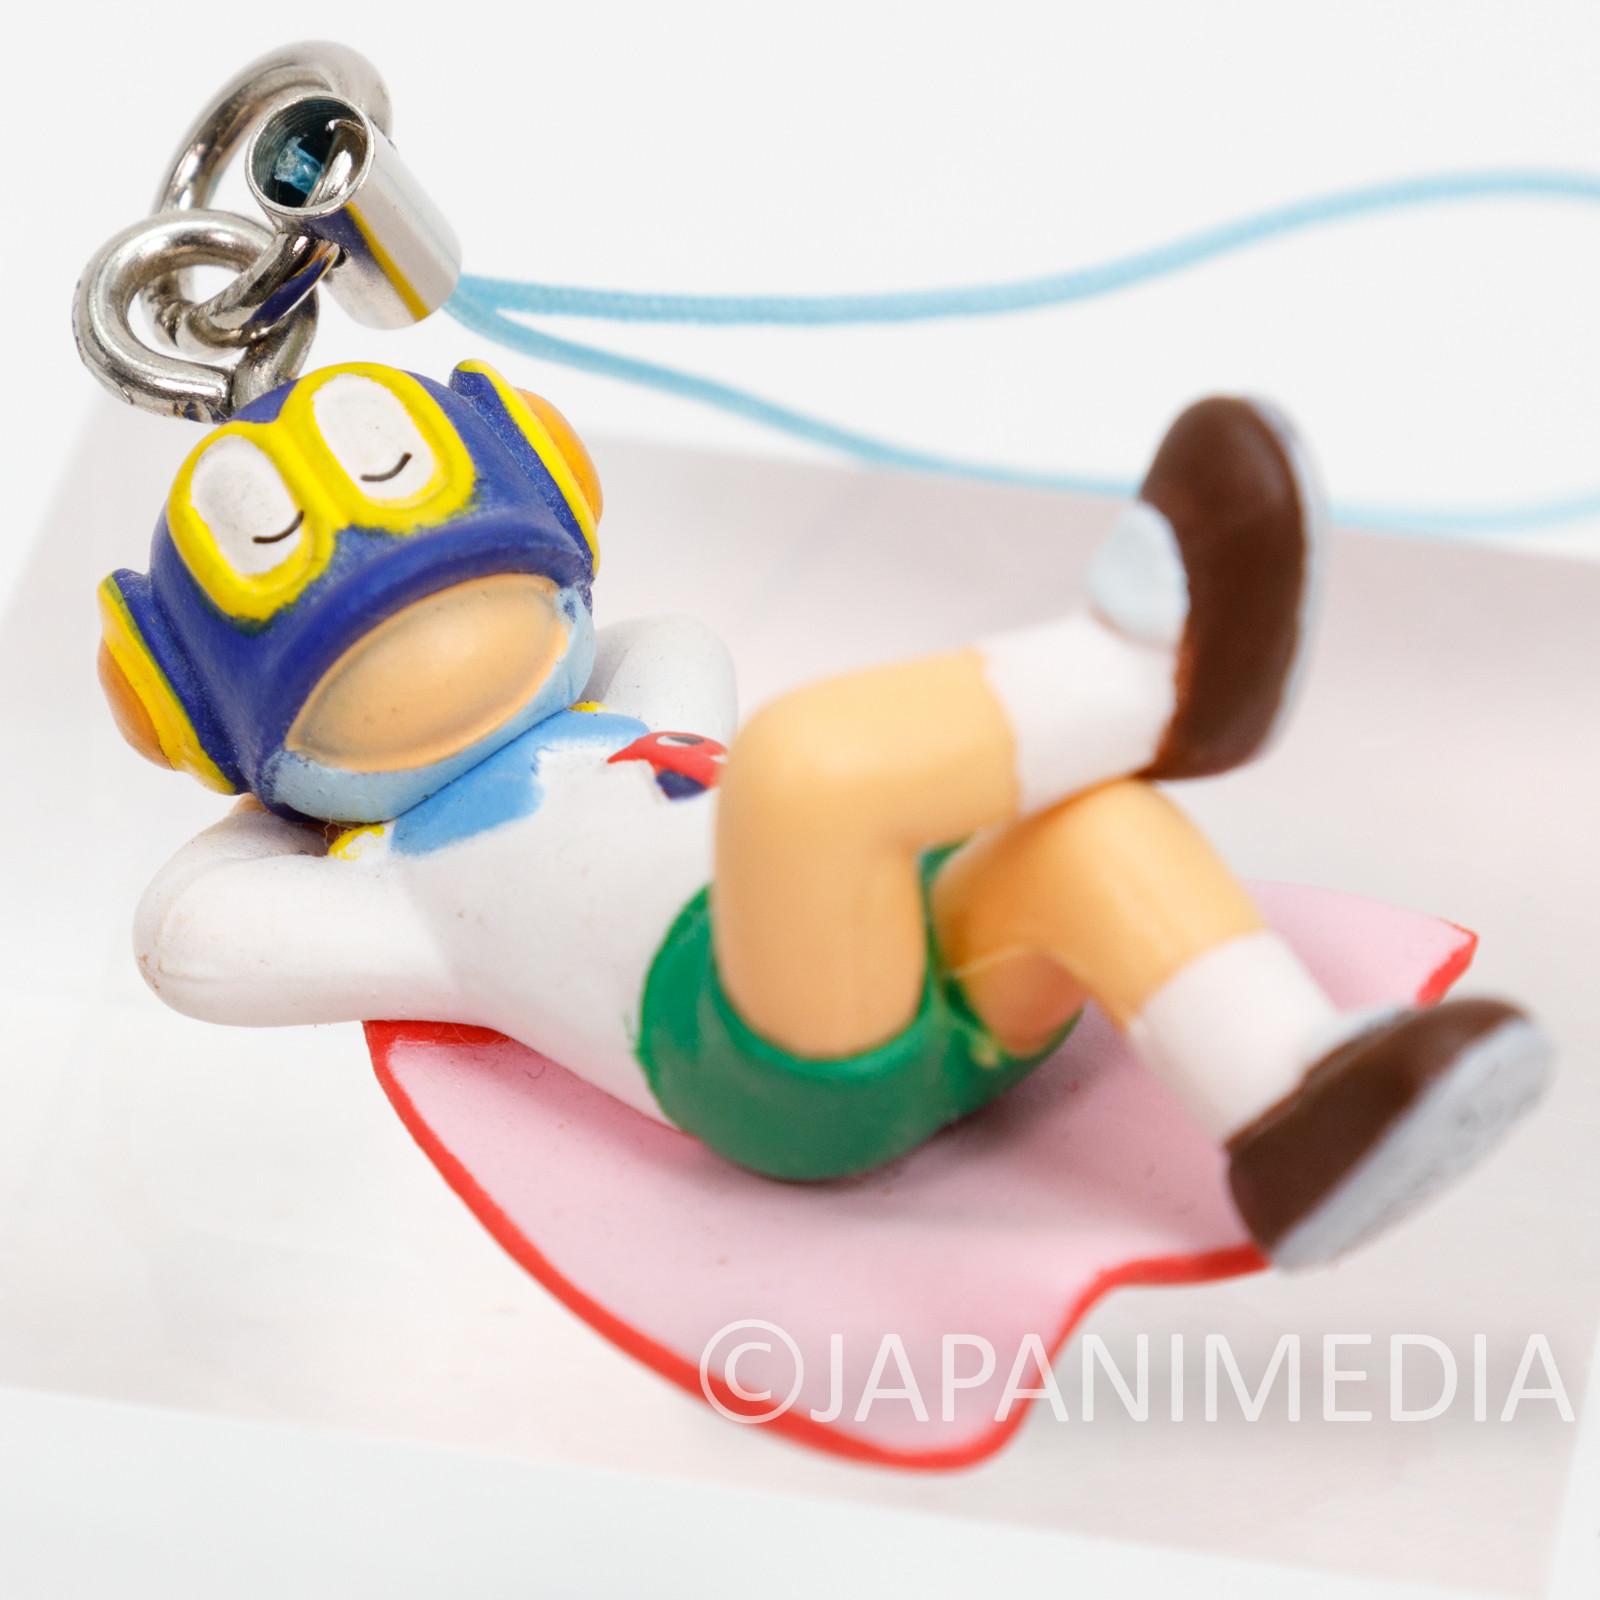 Perman Napping Figure Mascot Strap Fujiko F Fujio JAPAN ANIME MANGA